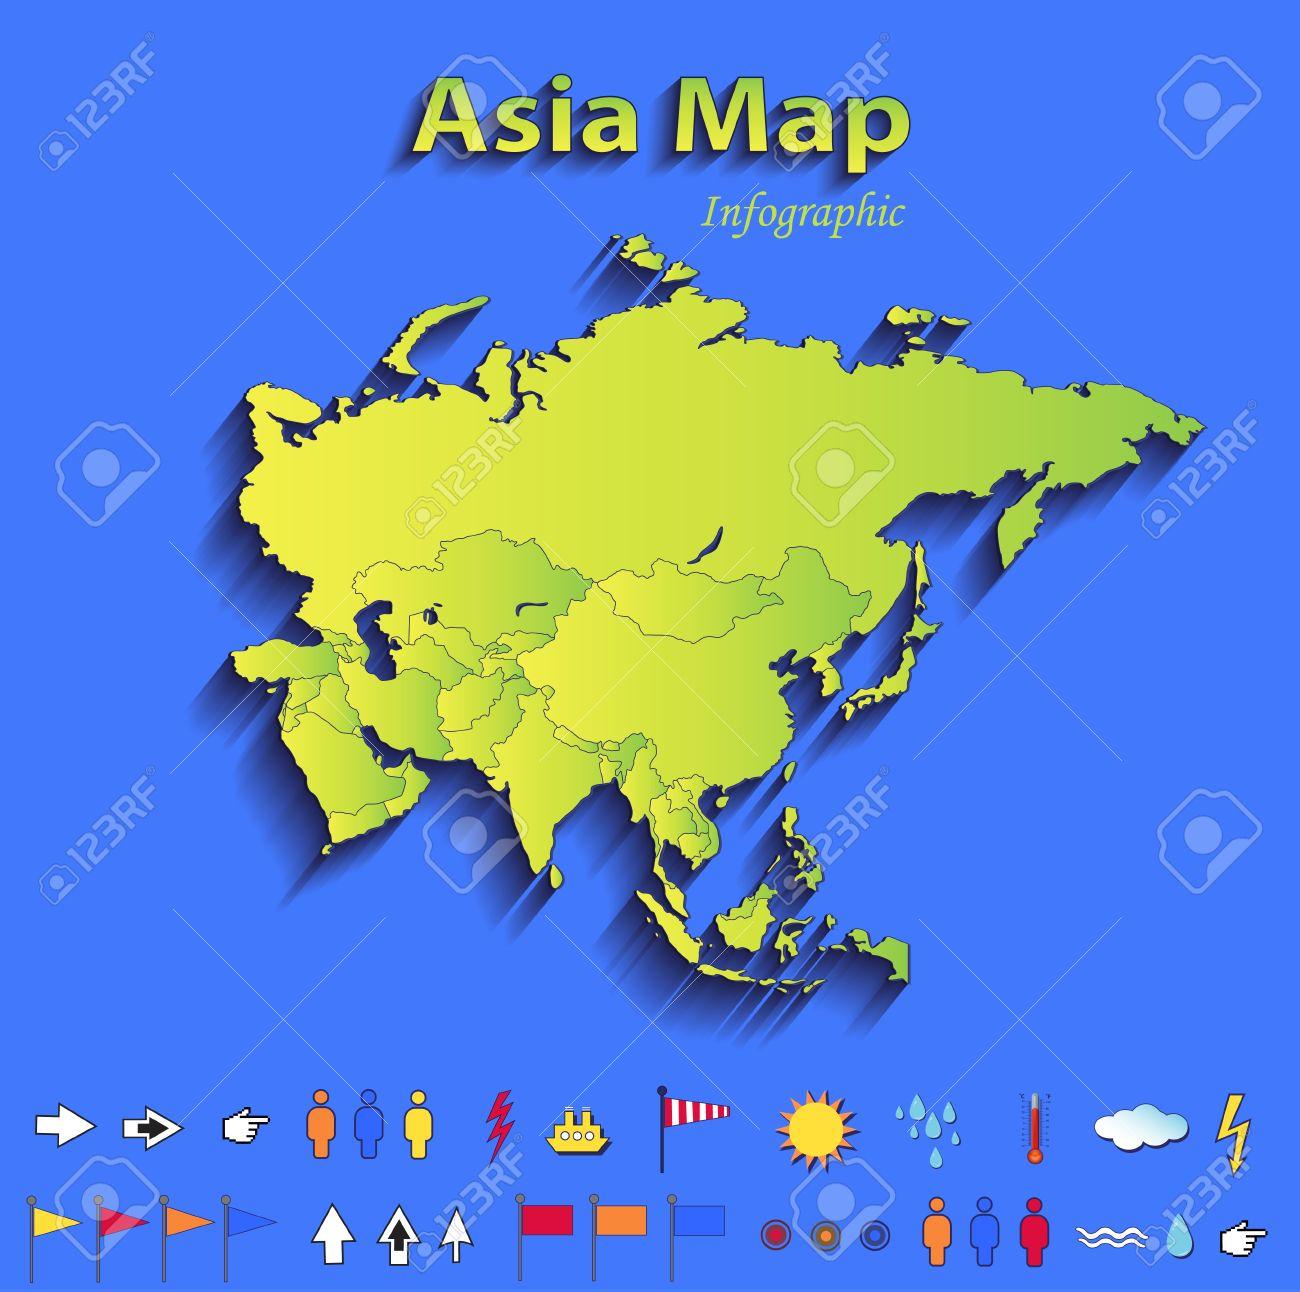 Landkarte Asien.Stock Photo